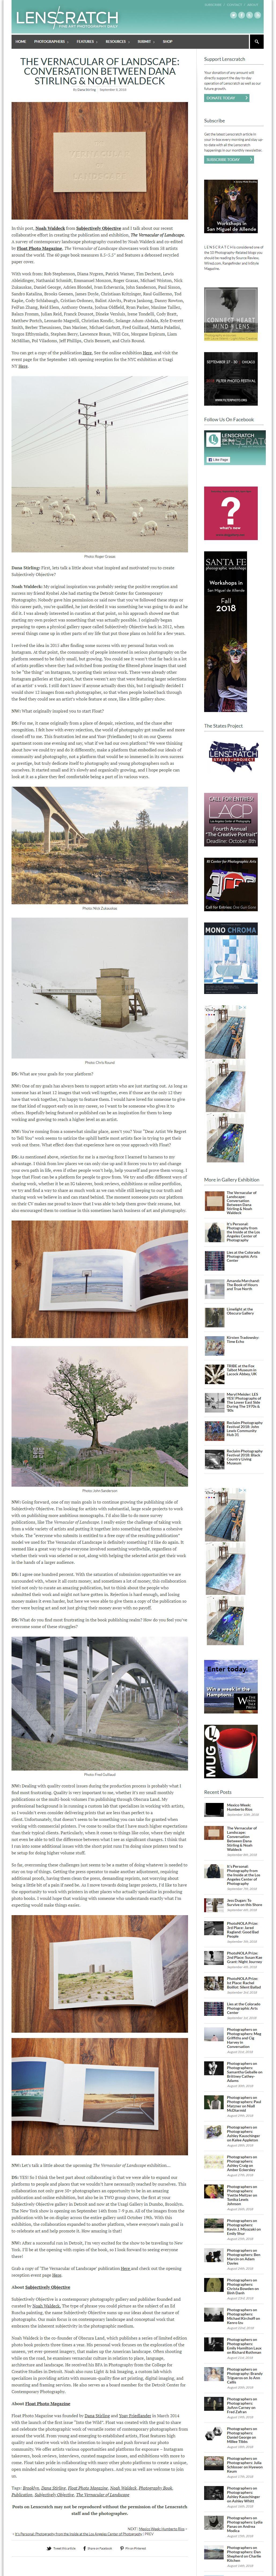 09-08-2018_The Vernacular of Landscape Conversation Between Dana Stirling & Noah Waldeck_Lenscratch.jpg